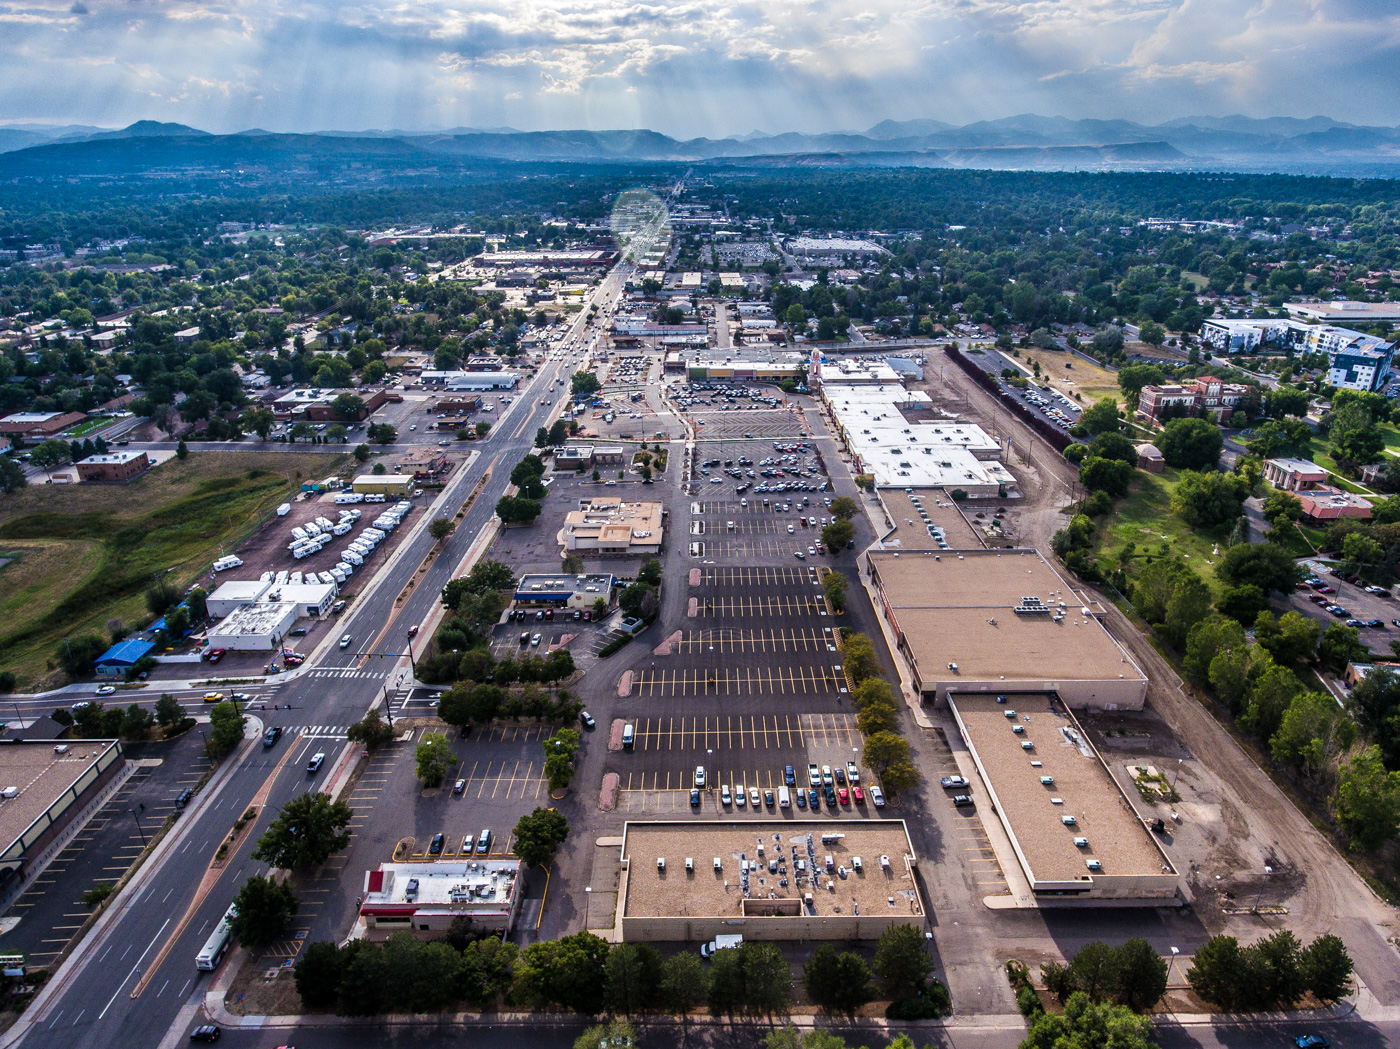 Lamar Station Plaza Aerial Photos (12 of 23).jpg